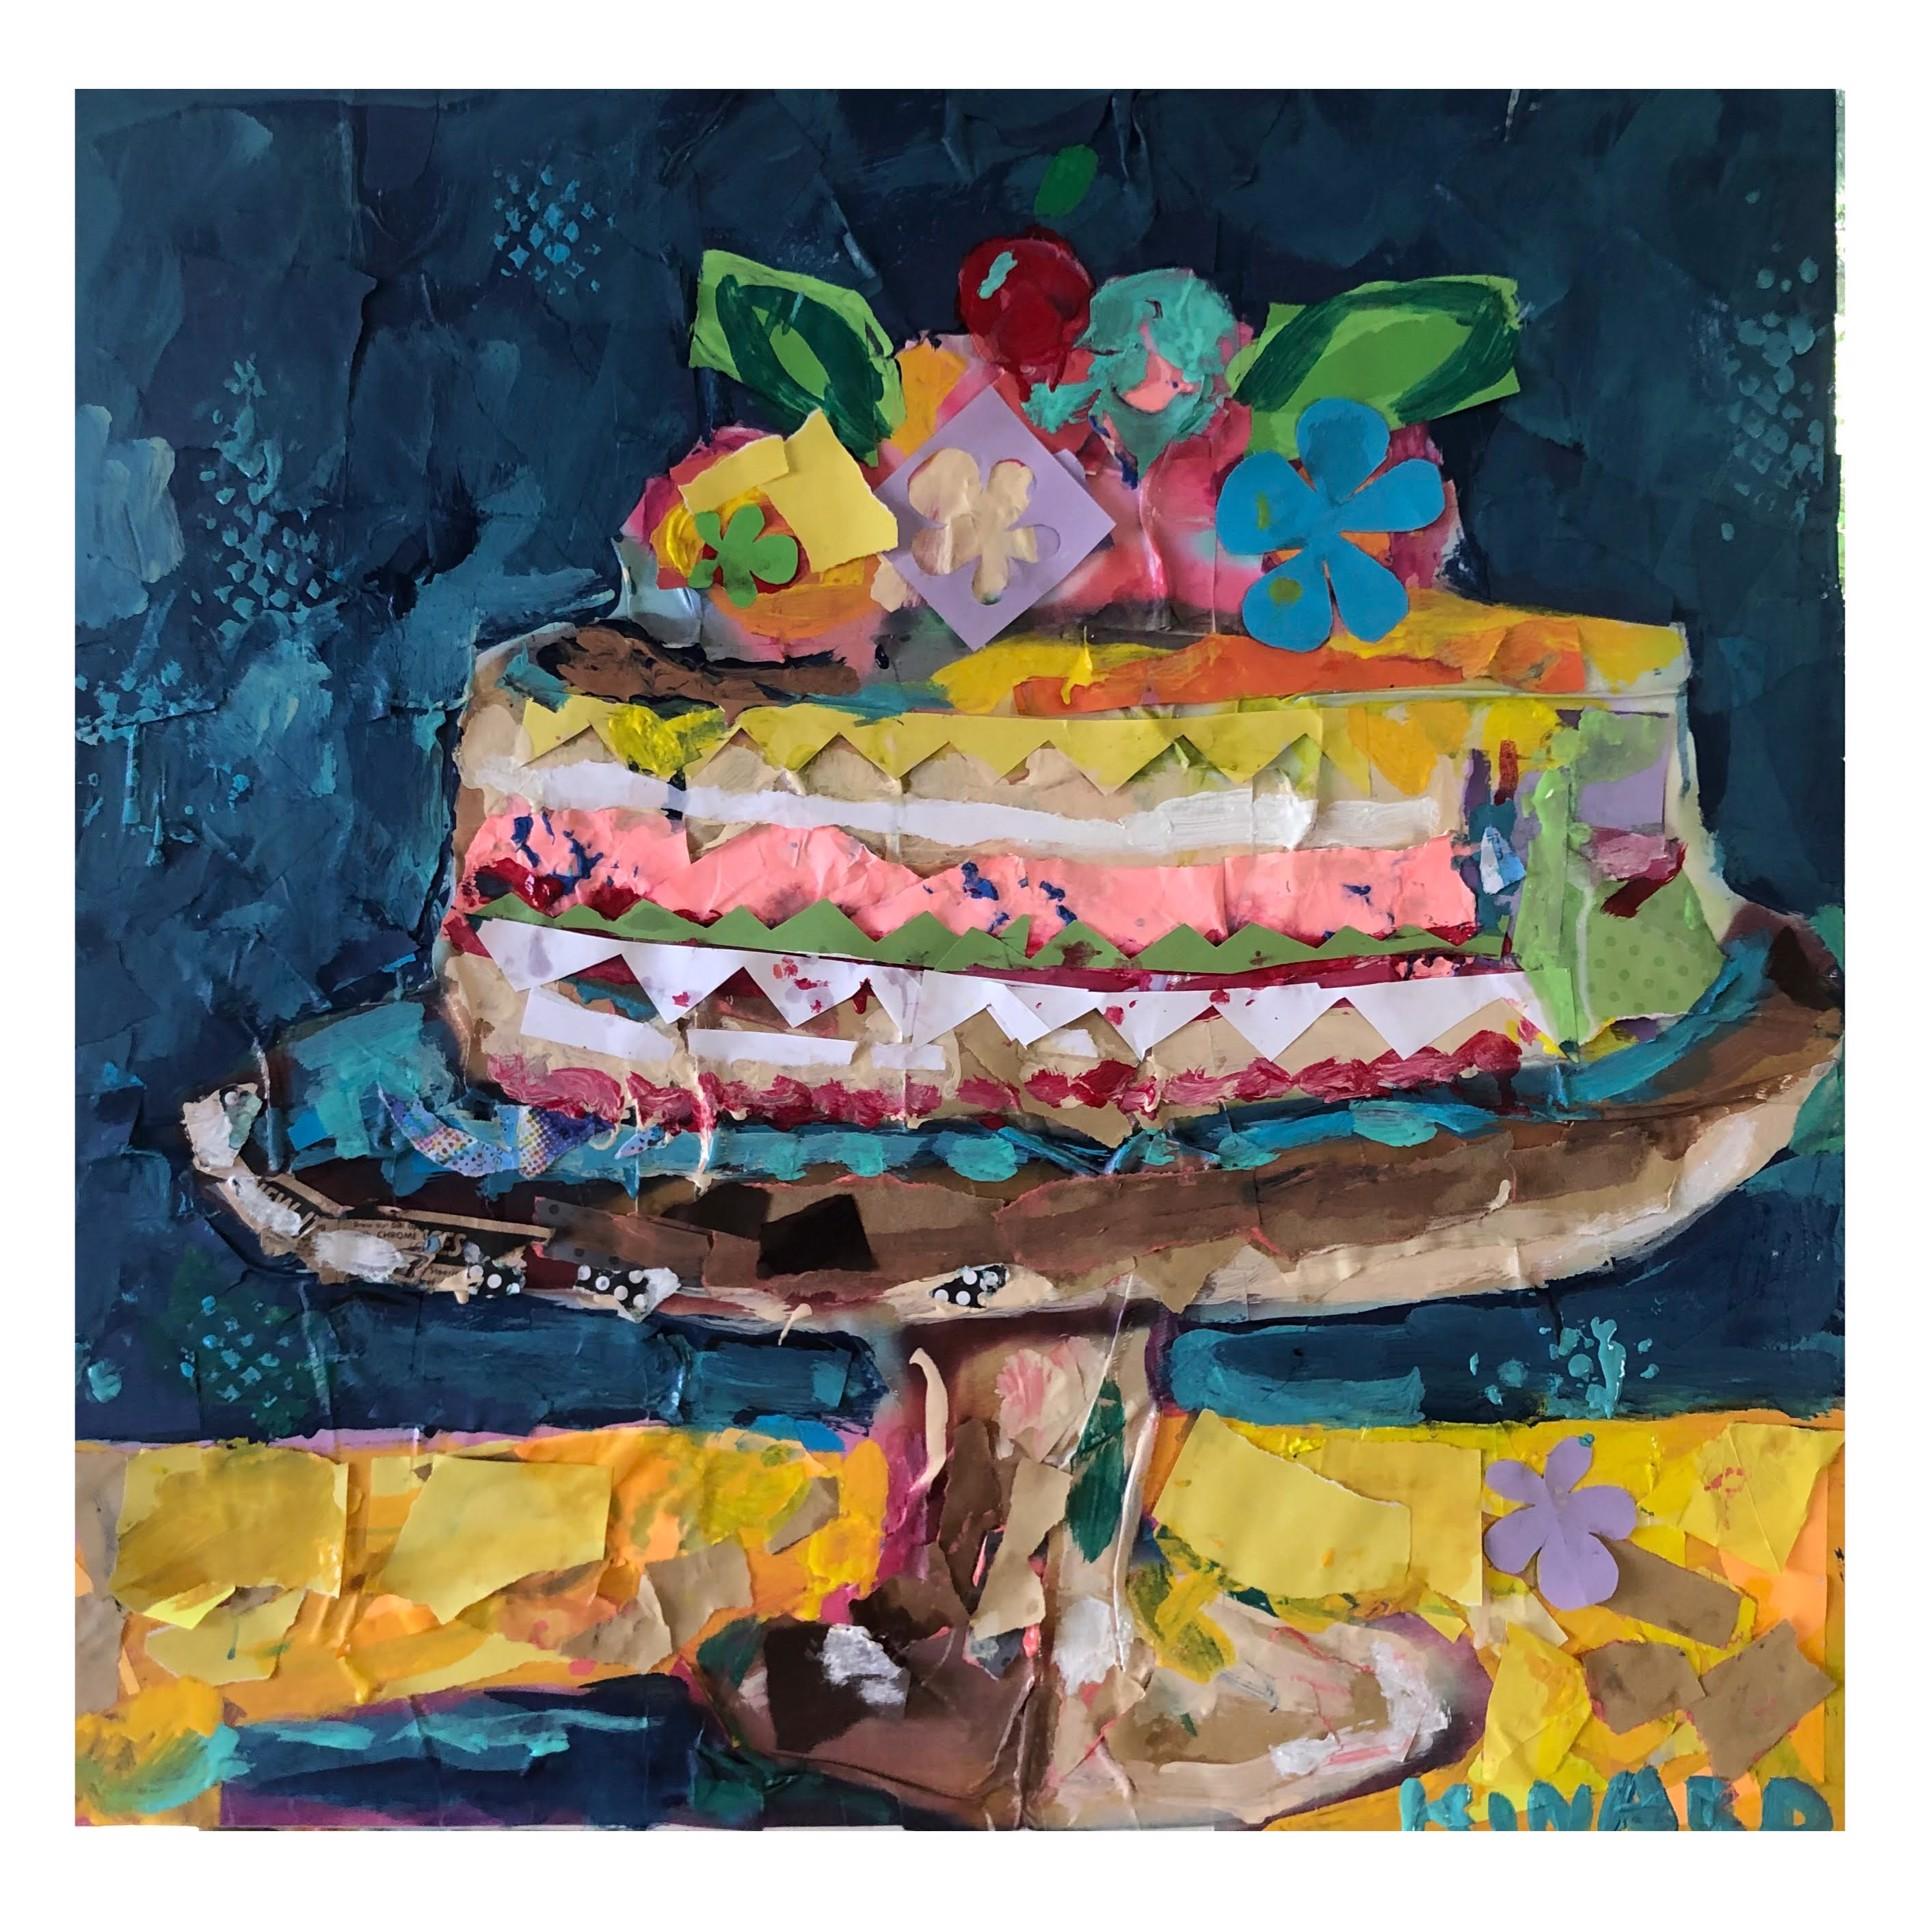 Take the Cake by Christy Kinard